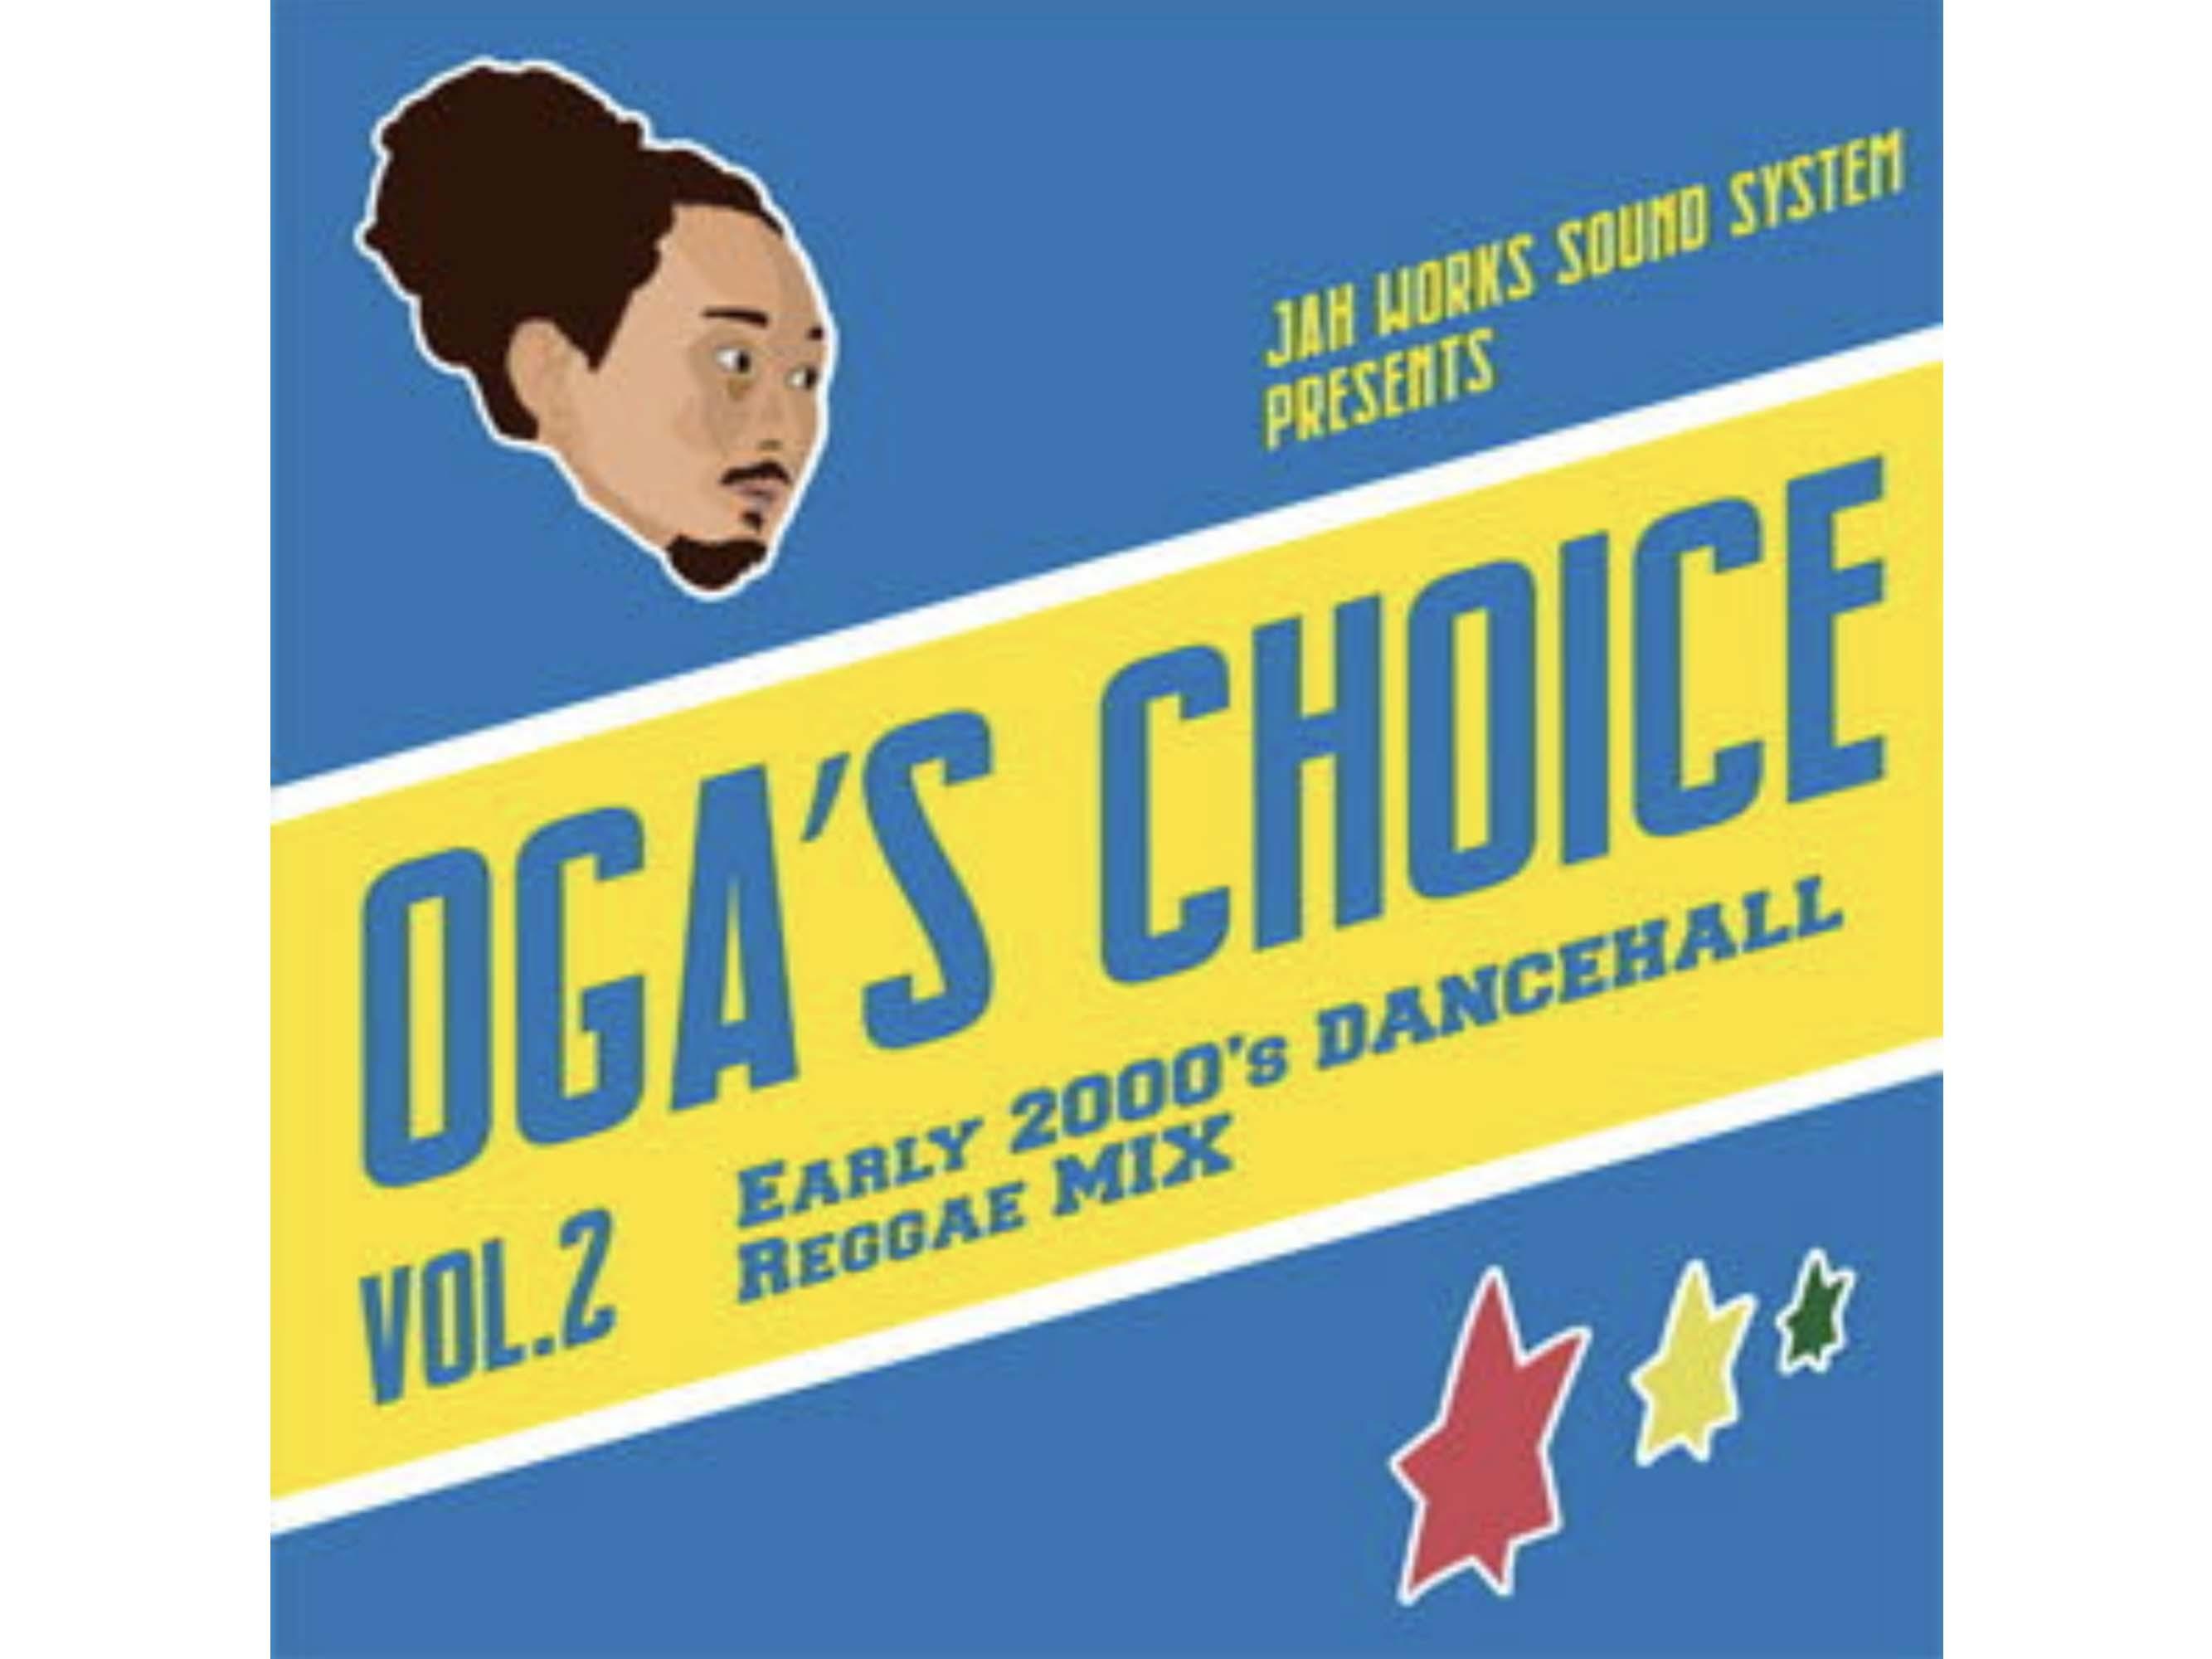 OGA'S CHOICE vol.2 EARLY 2000'S DANCEHALL REGGAE MIX - JAH WORKS